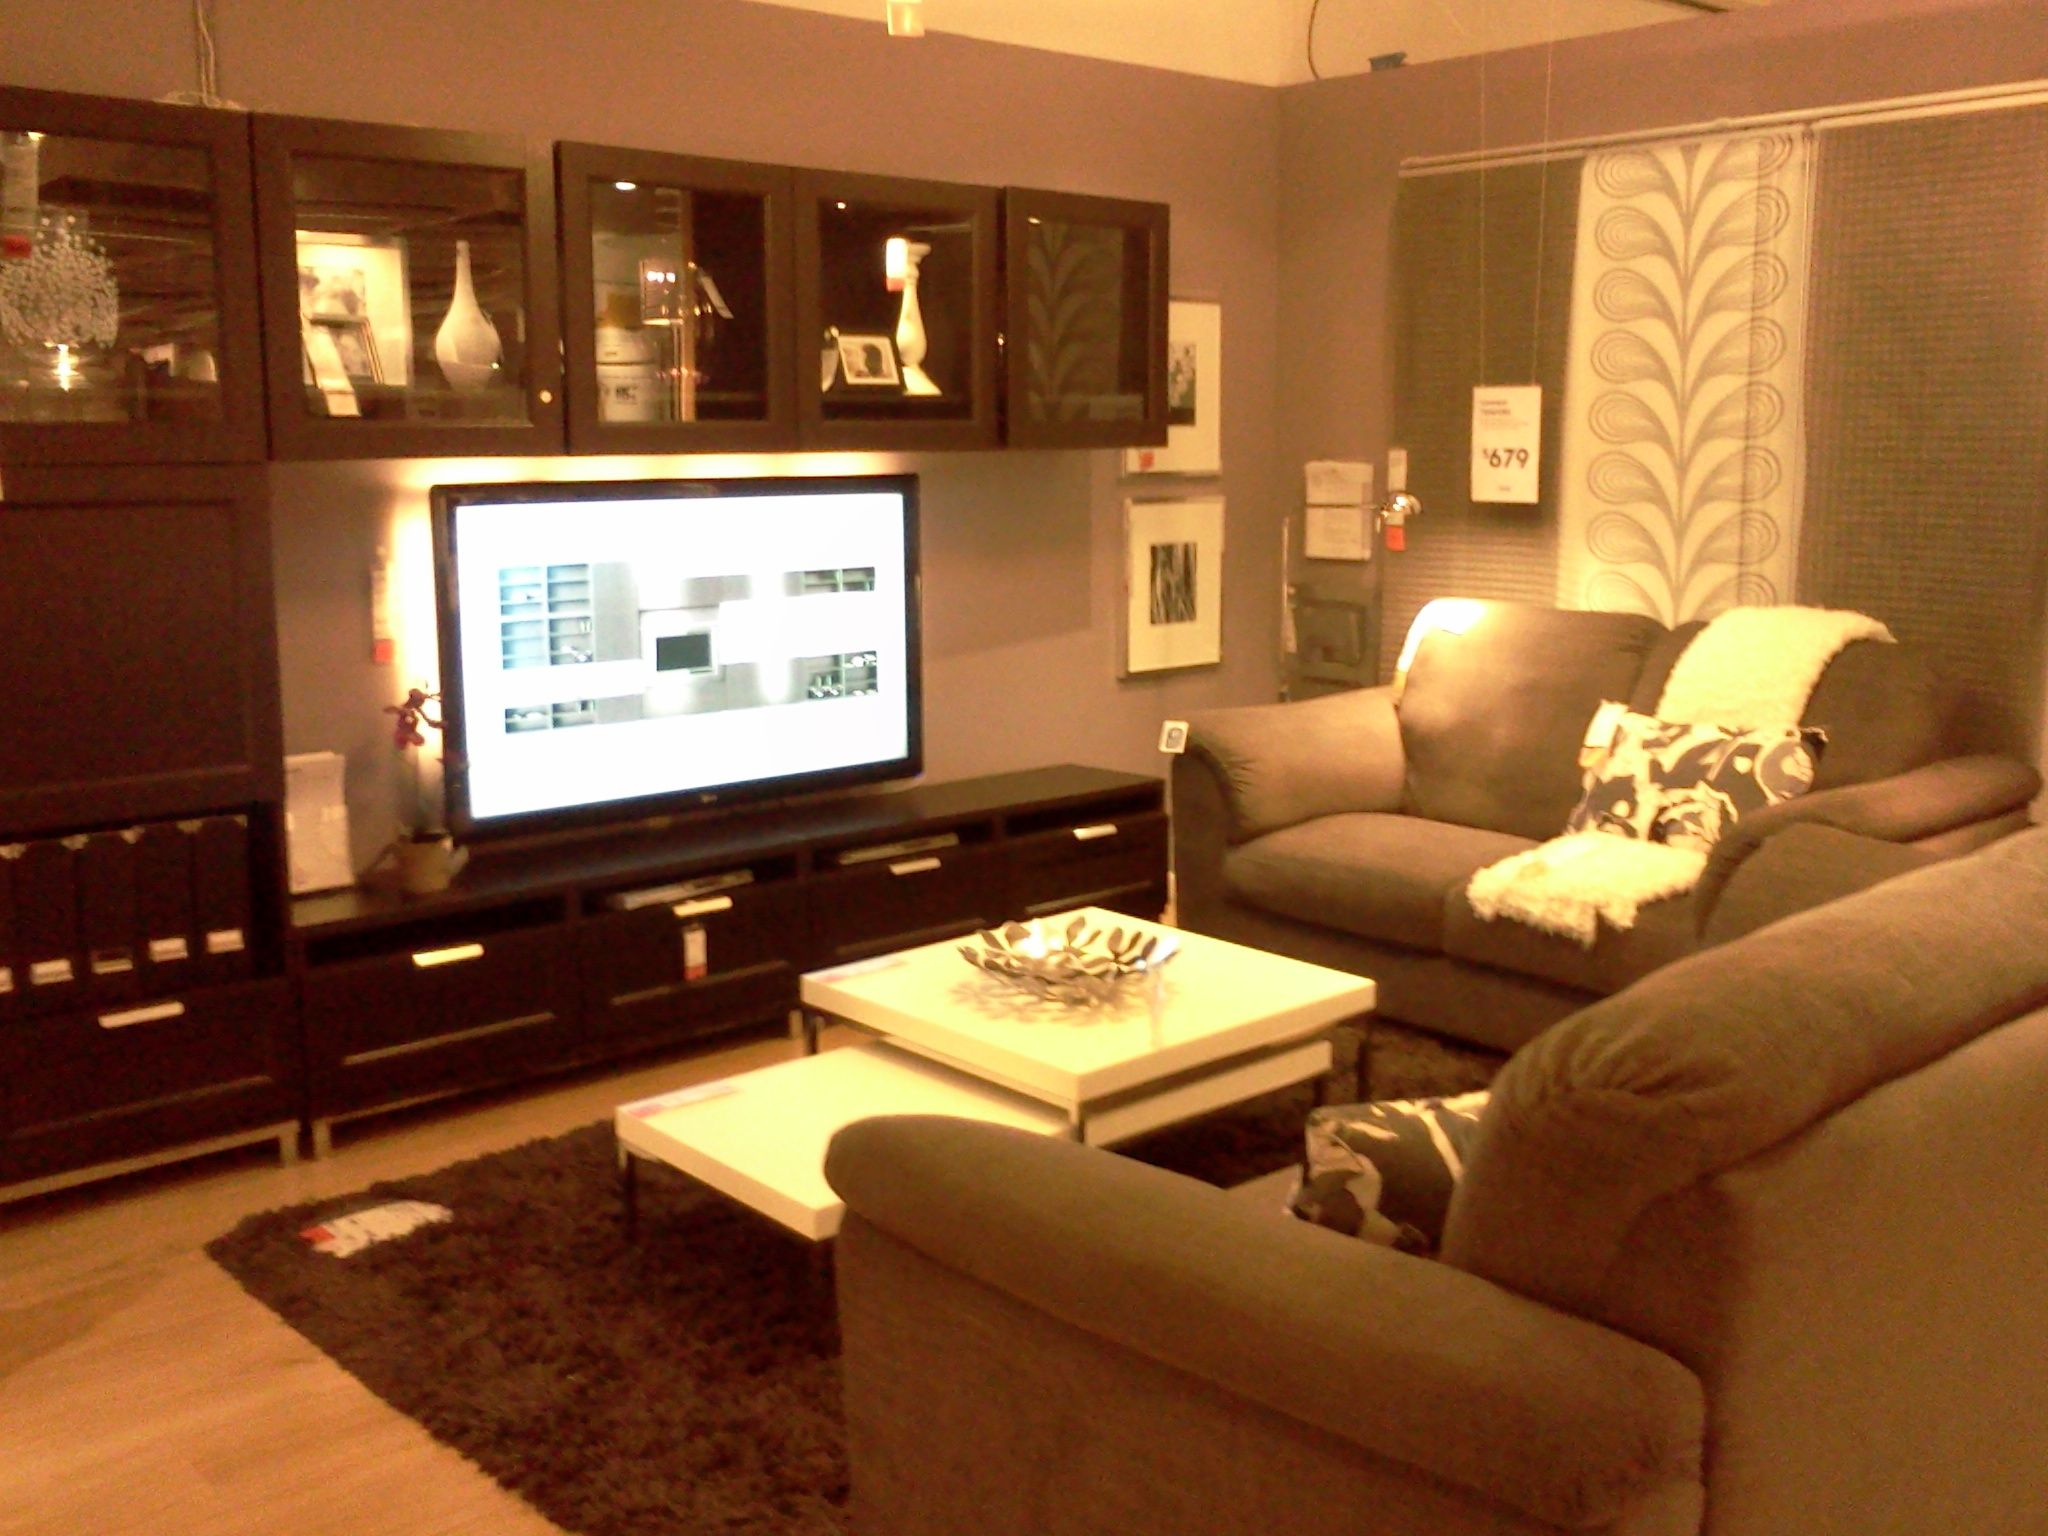 Ikea living room master bedroom pinterest living - Ikea living room decorating ideas ...